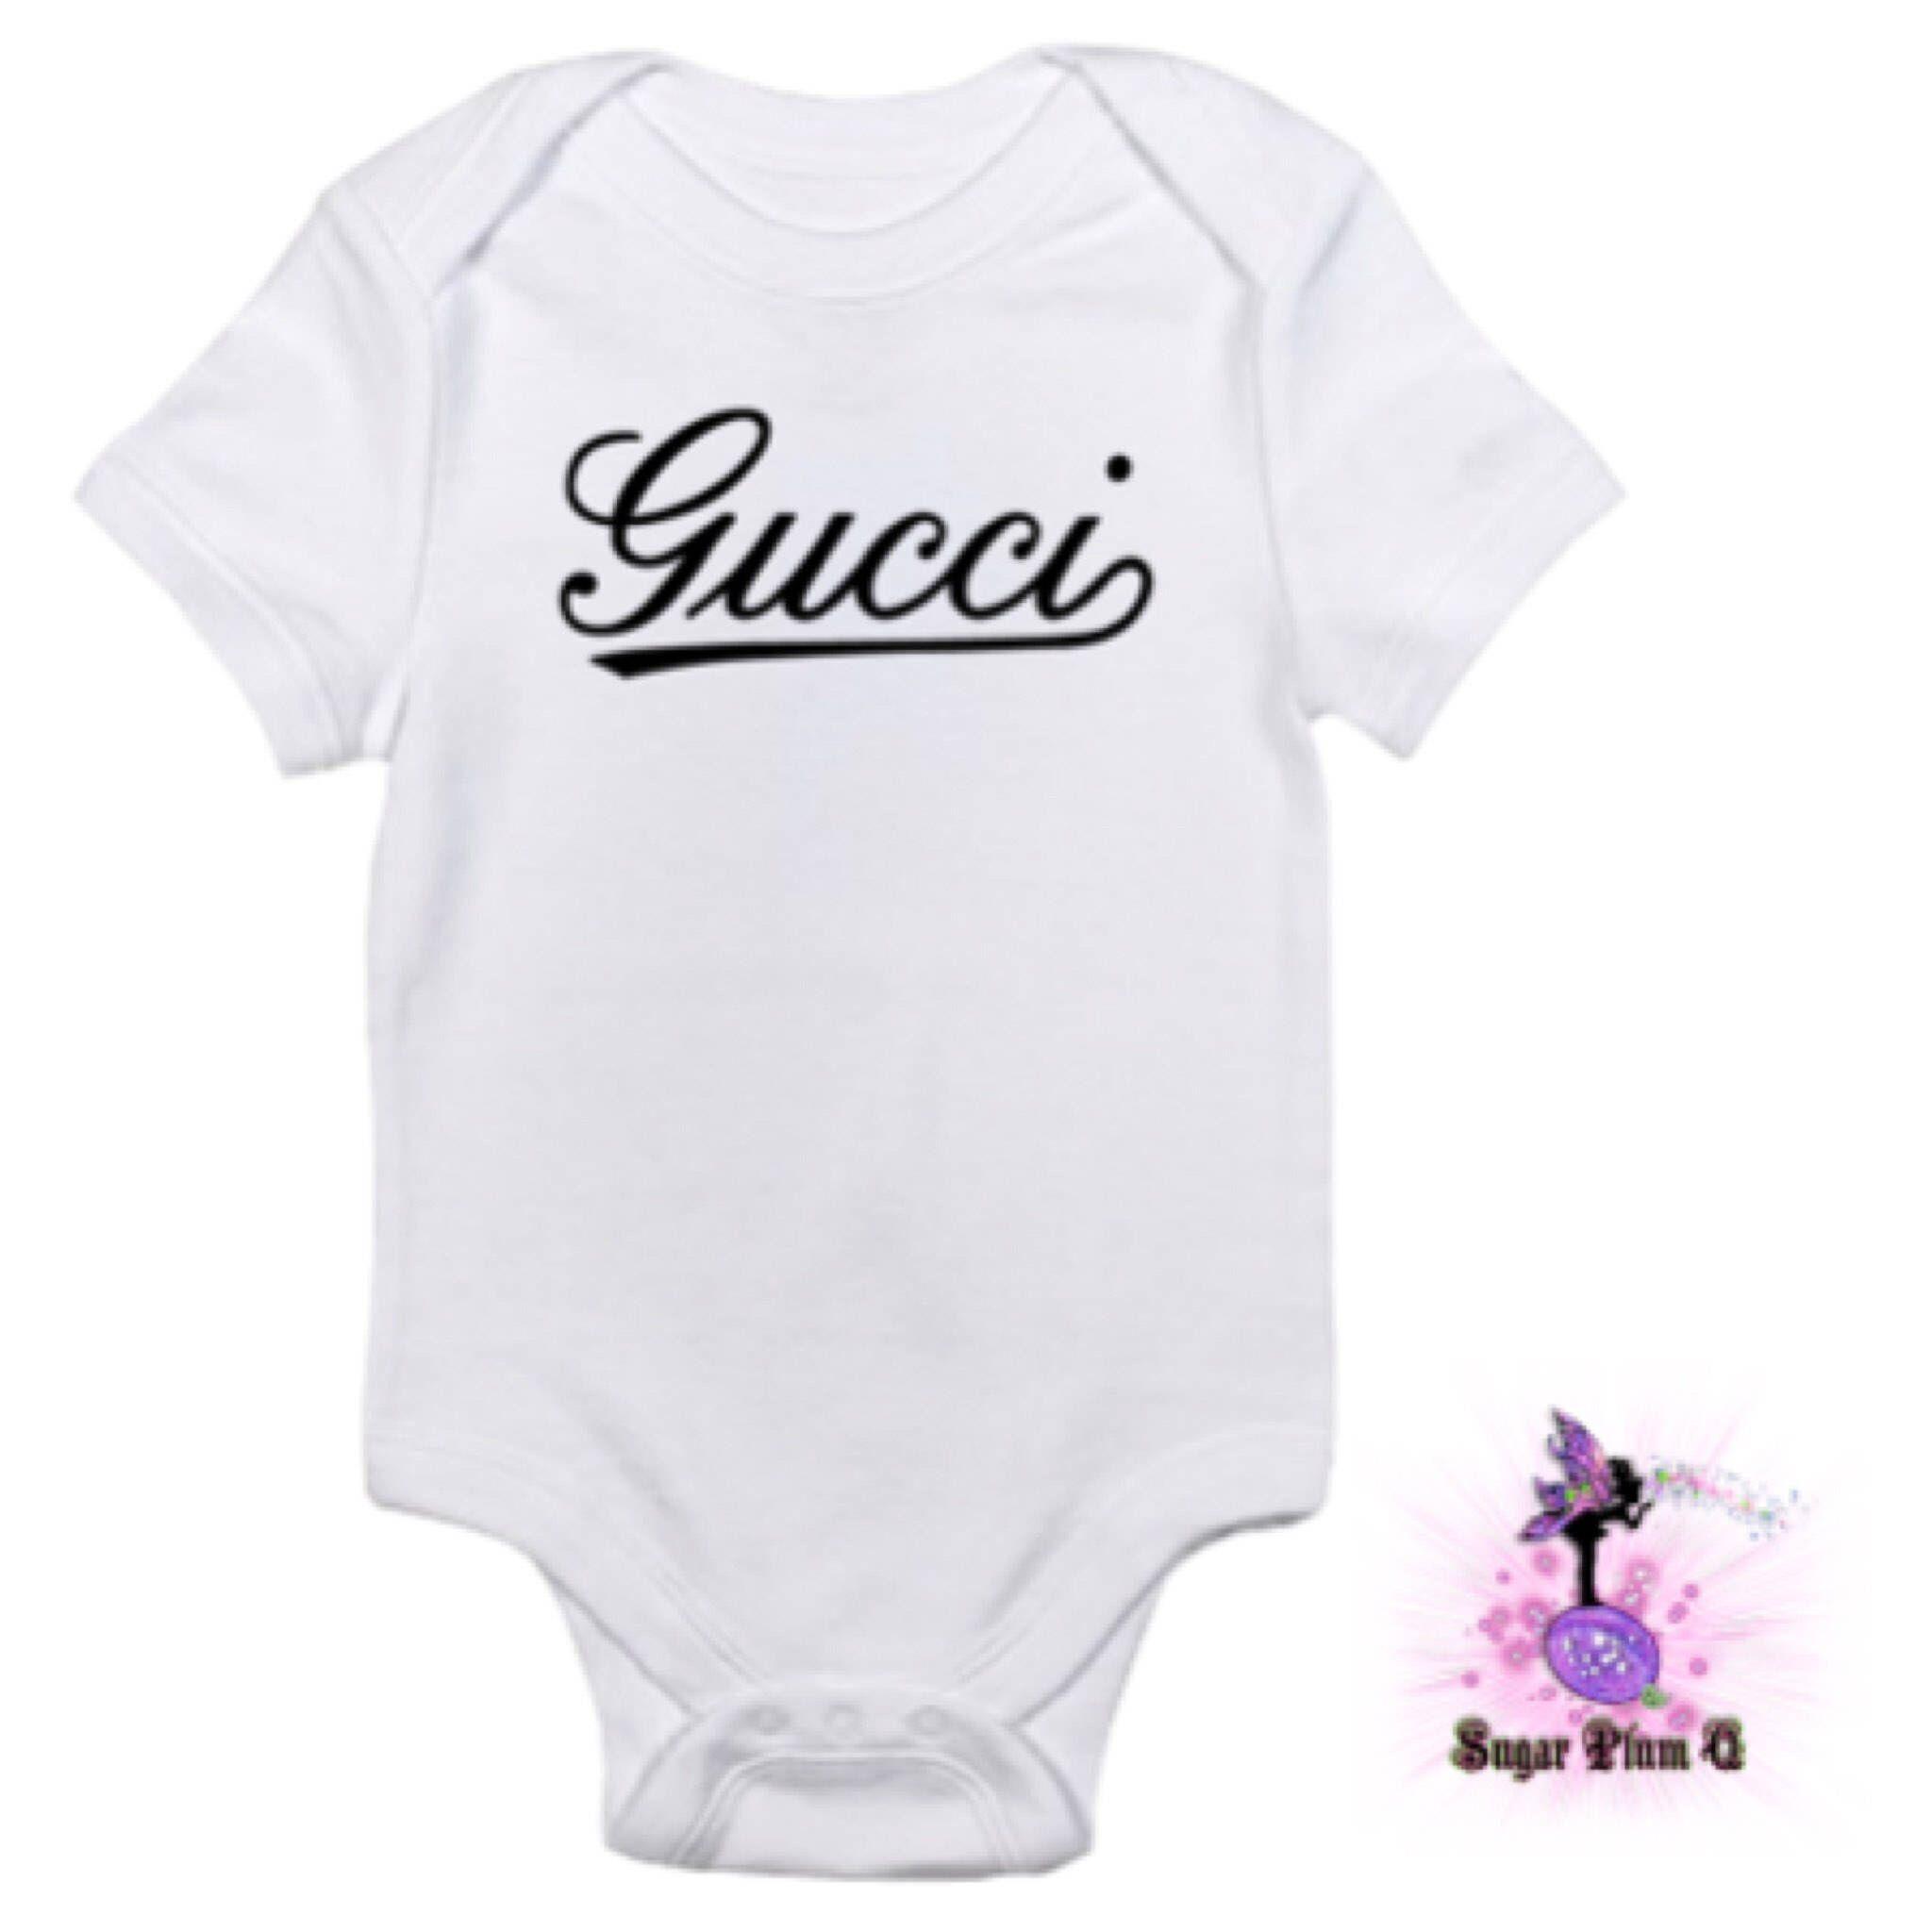 a9231269dae Designer Inspired Classic Gucci Baby Onesie Babyshower Gift